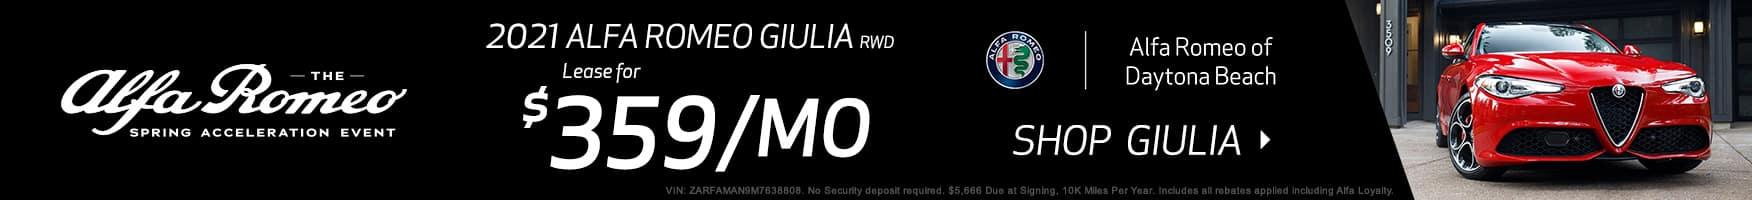 DMAR-2104-Alfa-Romeo-1752×200-01